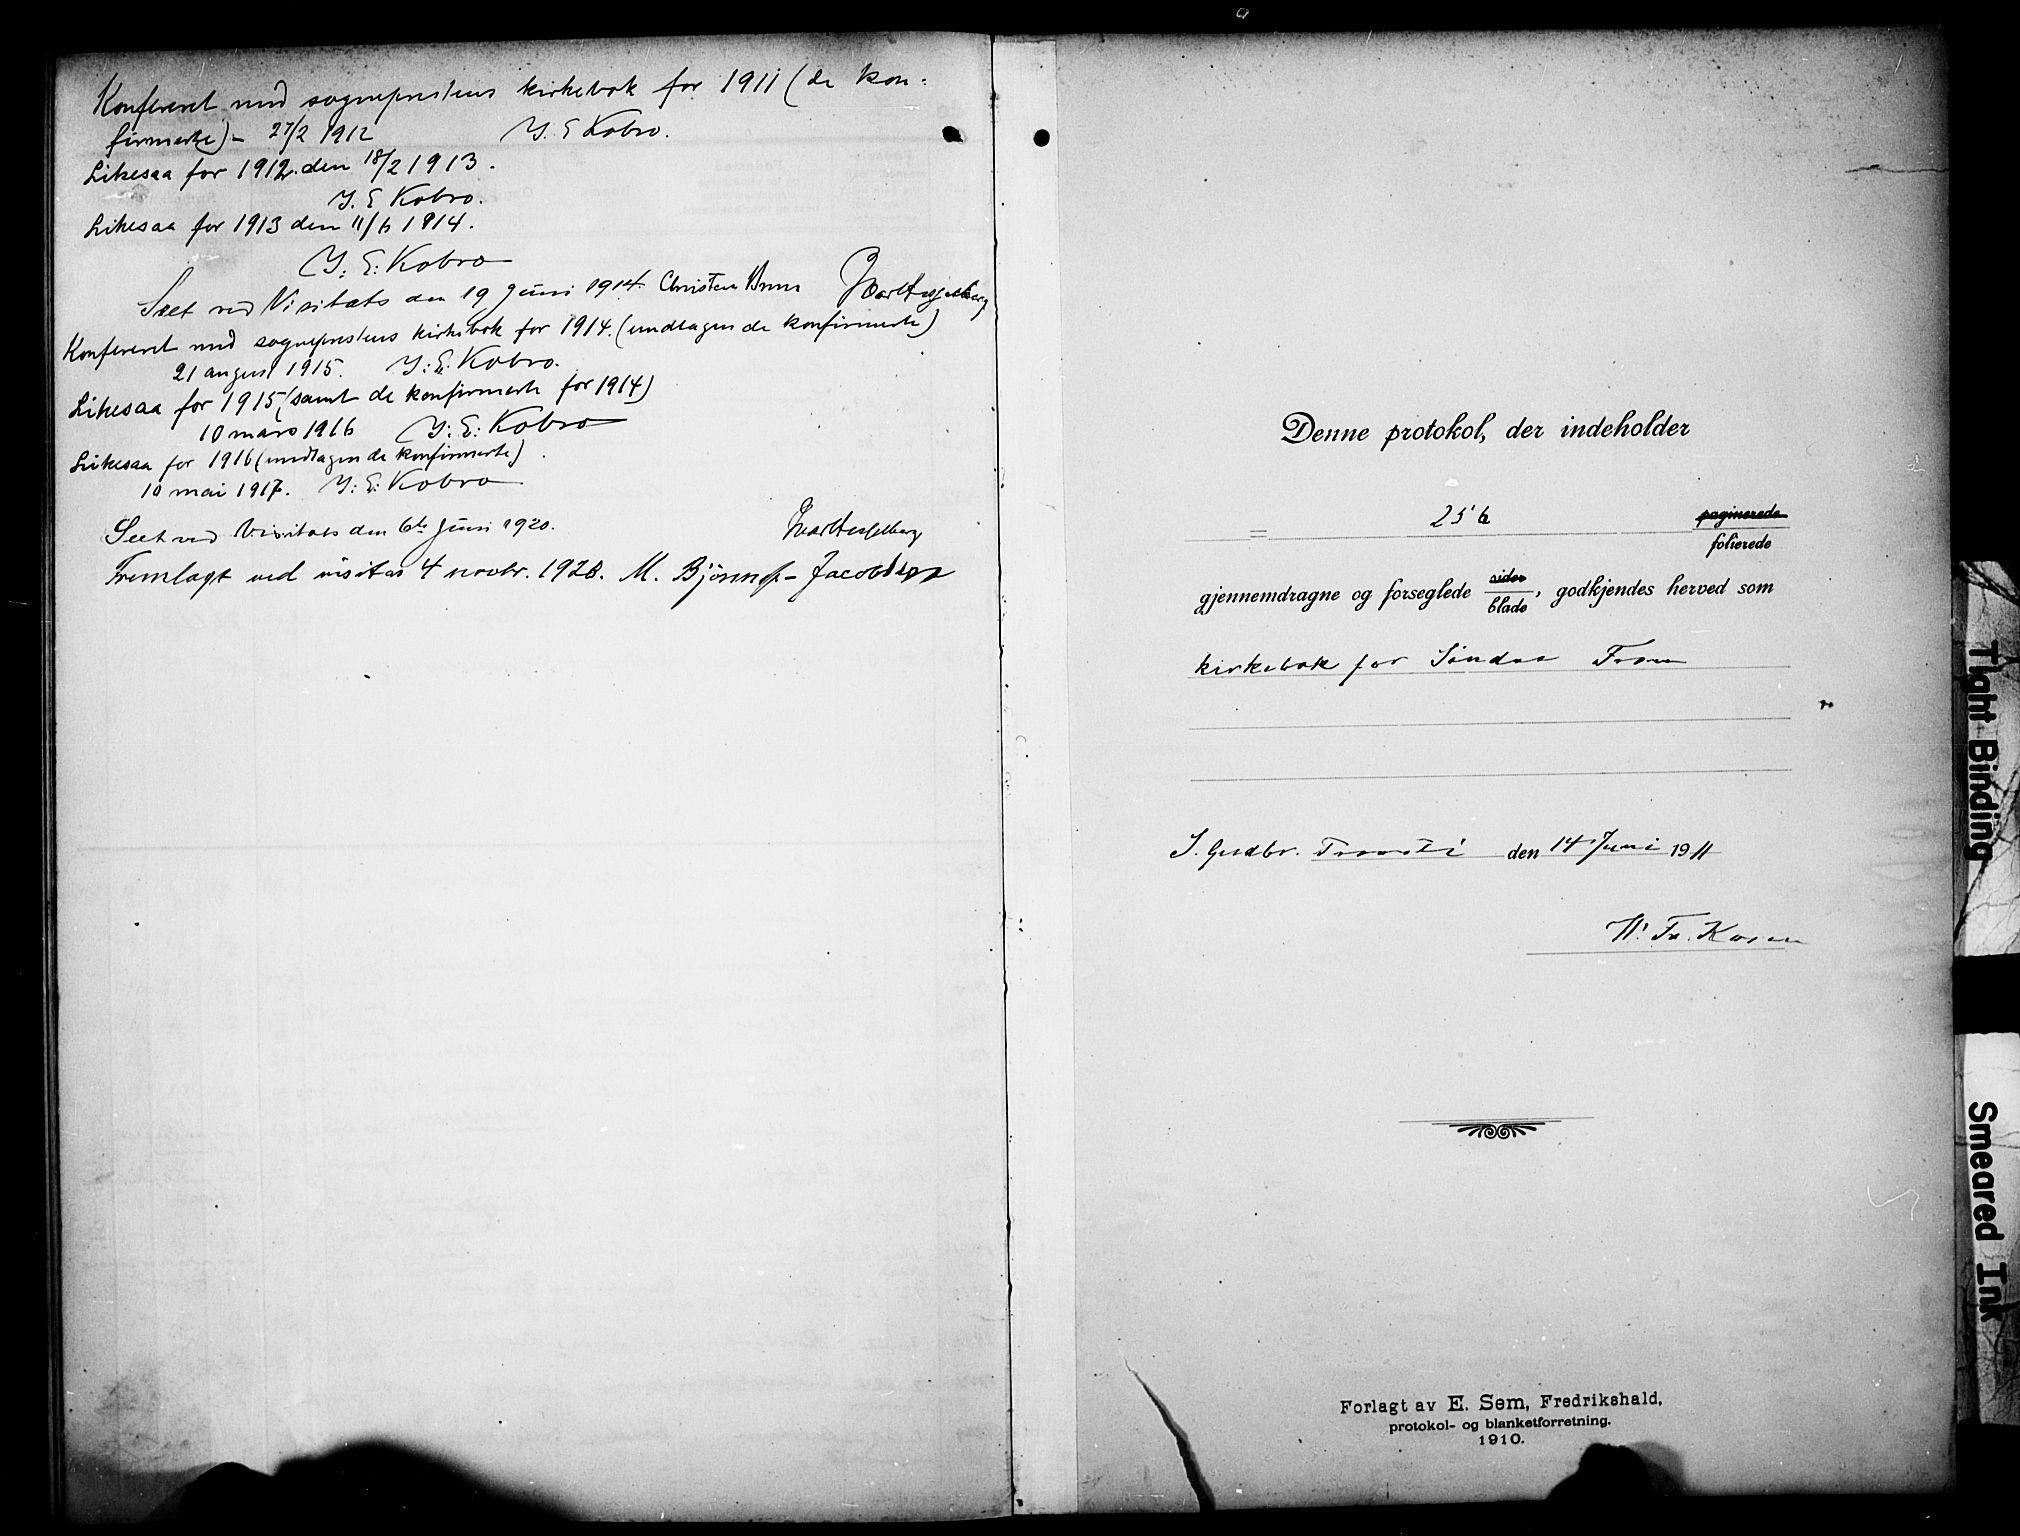 SAH, Sør-Fron prestekontor, H/Ha/Hab/L0005: Klokkerbok nr. 5, 1912-1930, s. 257